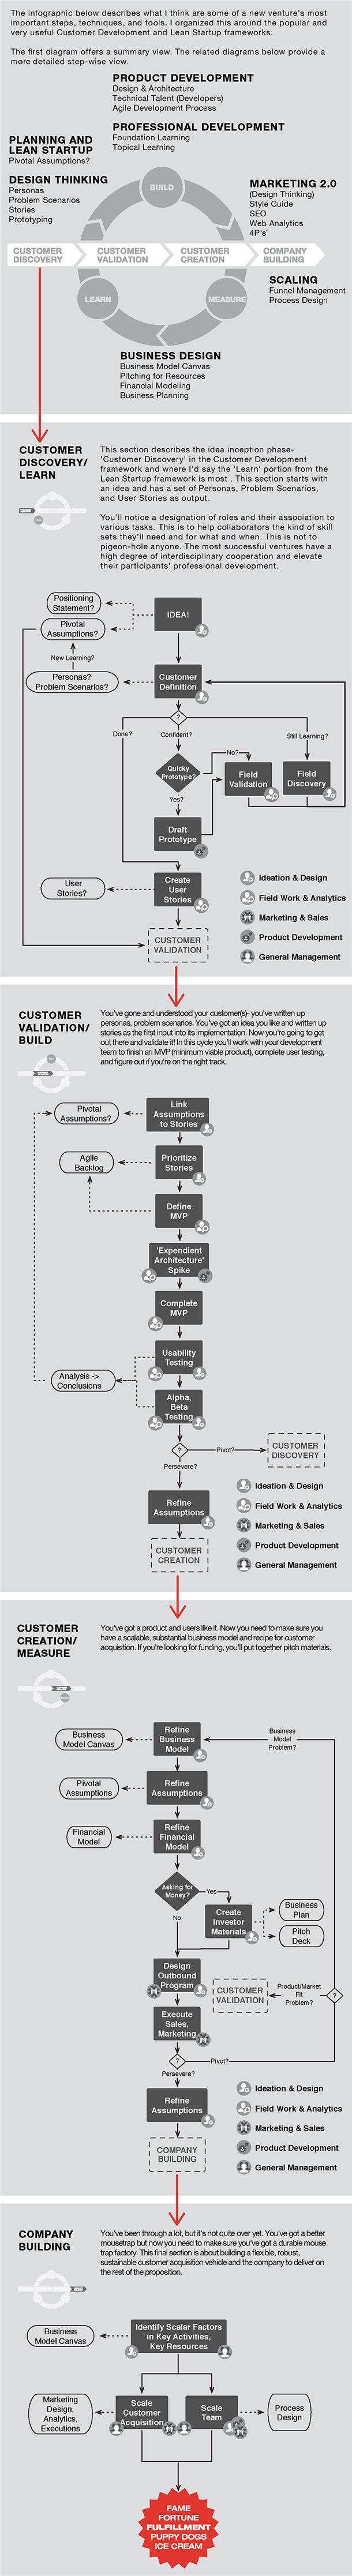 Customer development and Lean Startup.